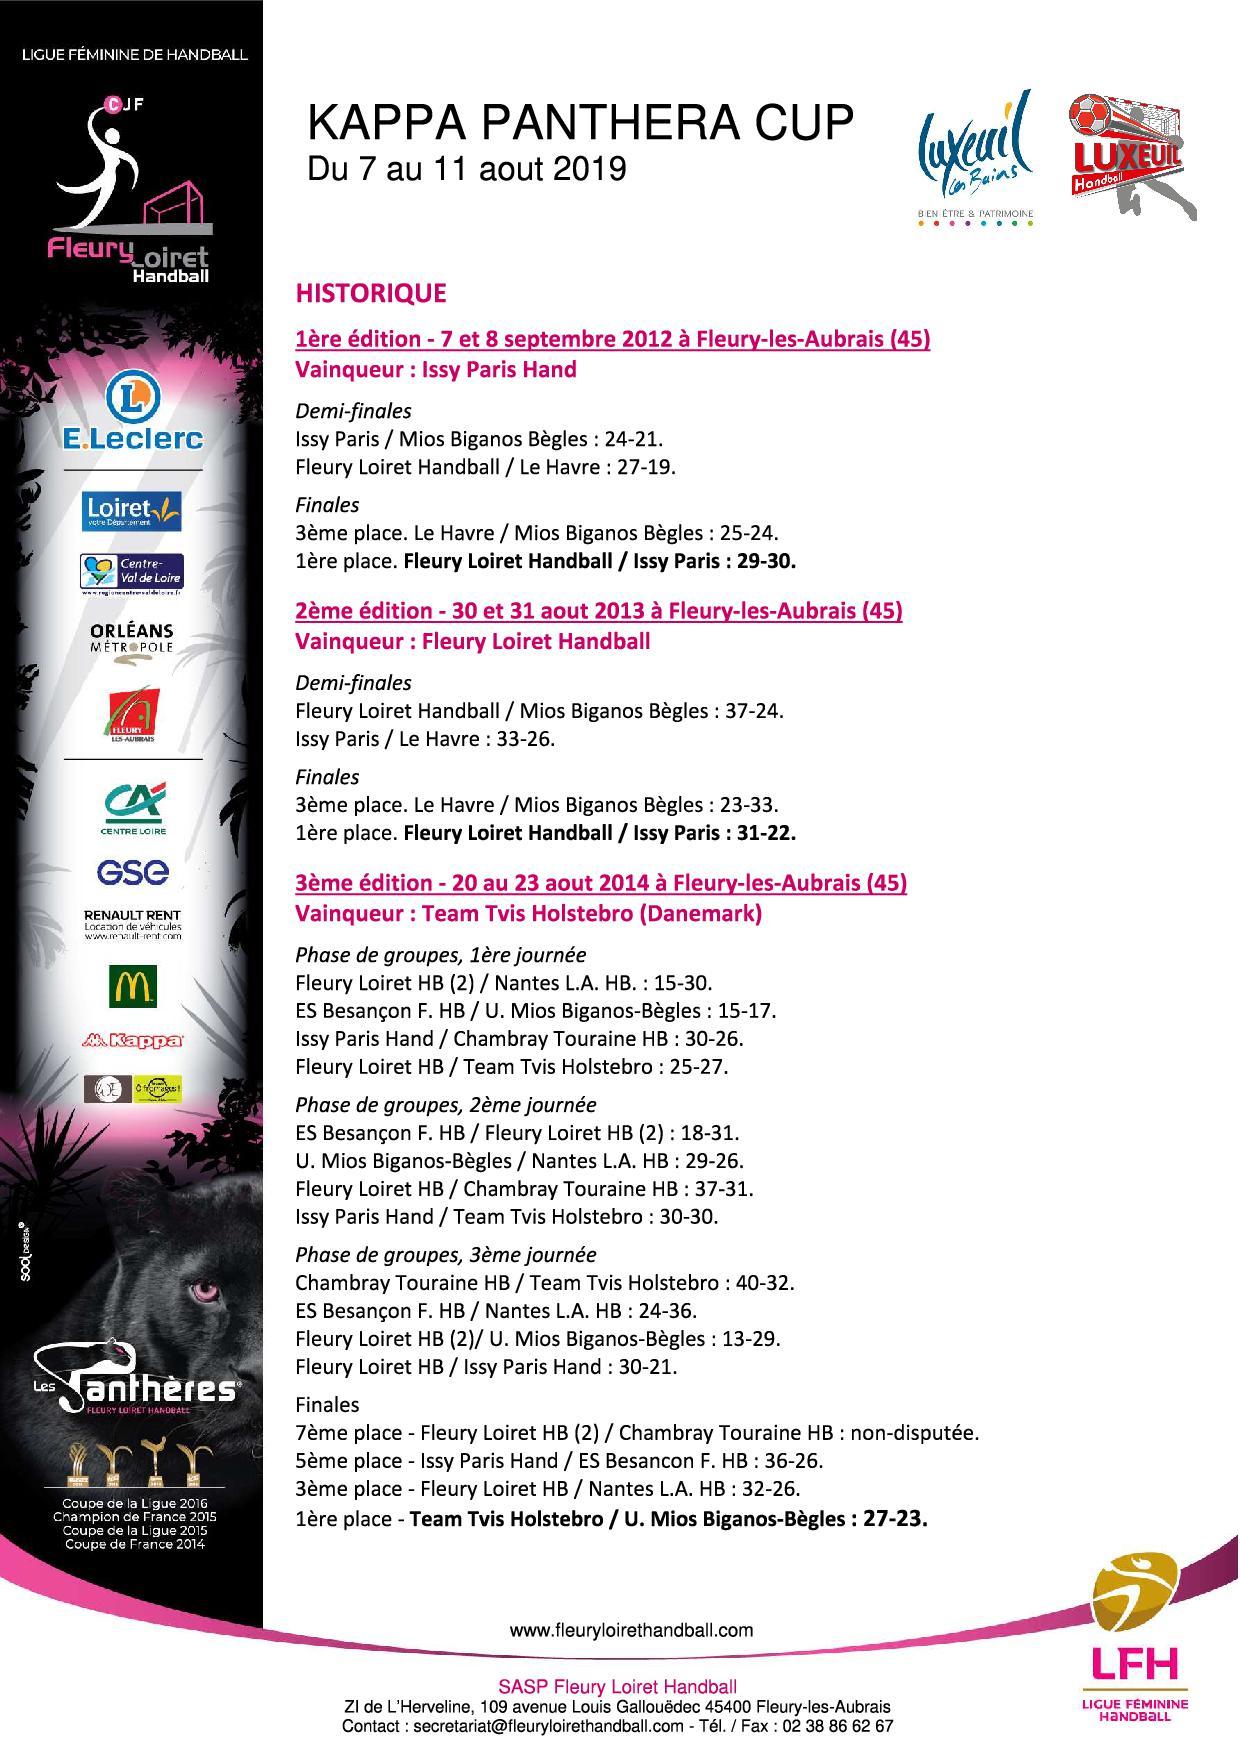 Communiqué Fleury Loiret Handball - Jeudi 20 juin 2019 - Communiqué Fleury Loiret Handball - Jeudi 20 juin 20196.jpg